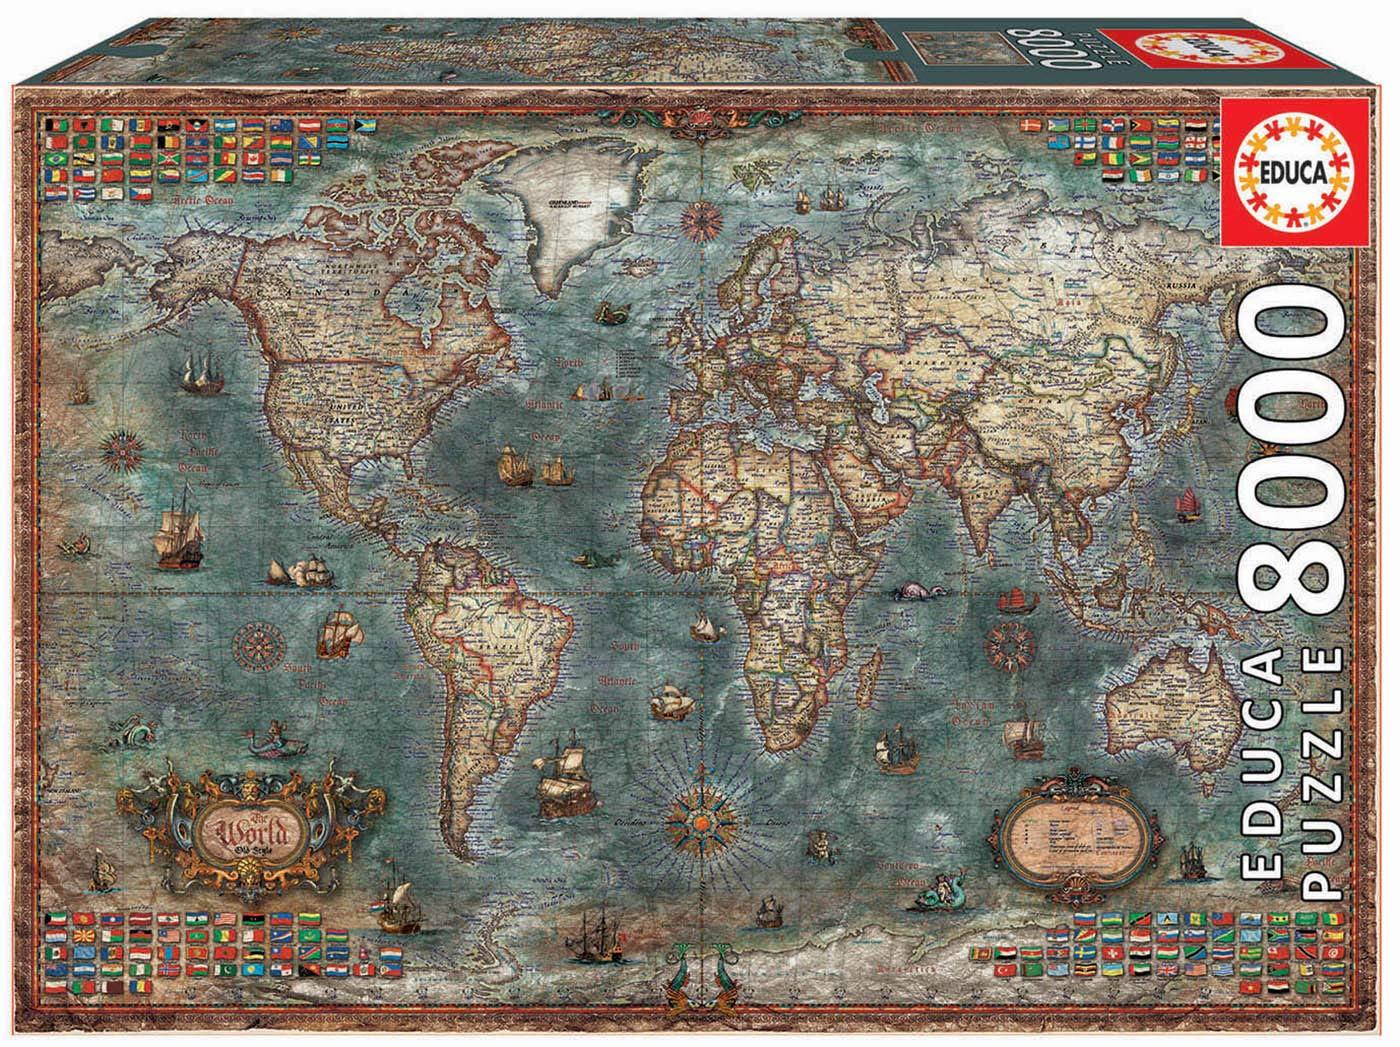 Vari/é Varié Educa Borrás 18017 Educa Borr/ás-8000 Mappemonde Historique Puzzle